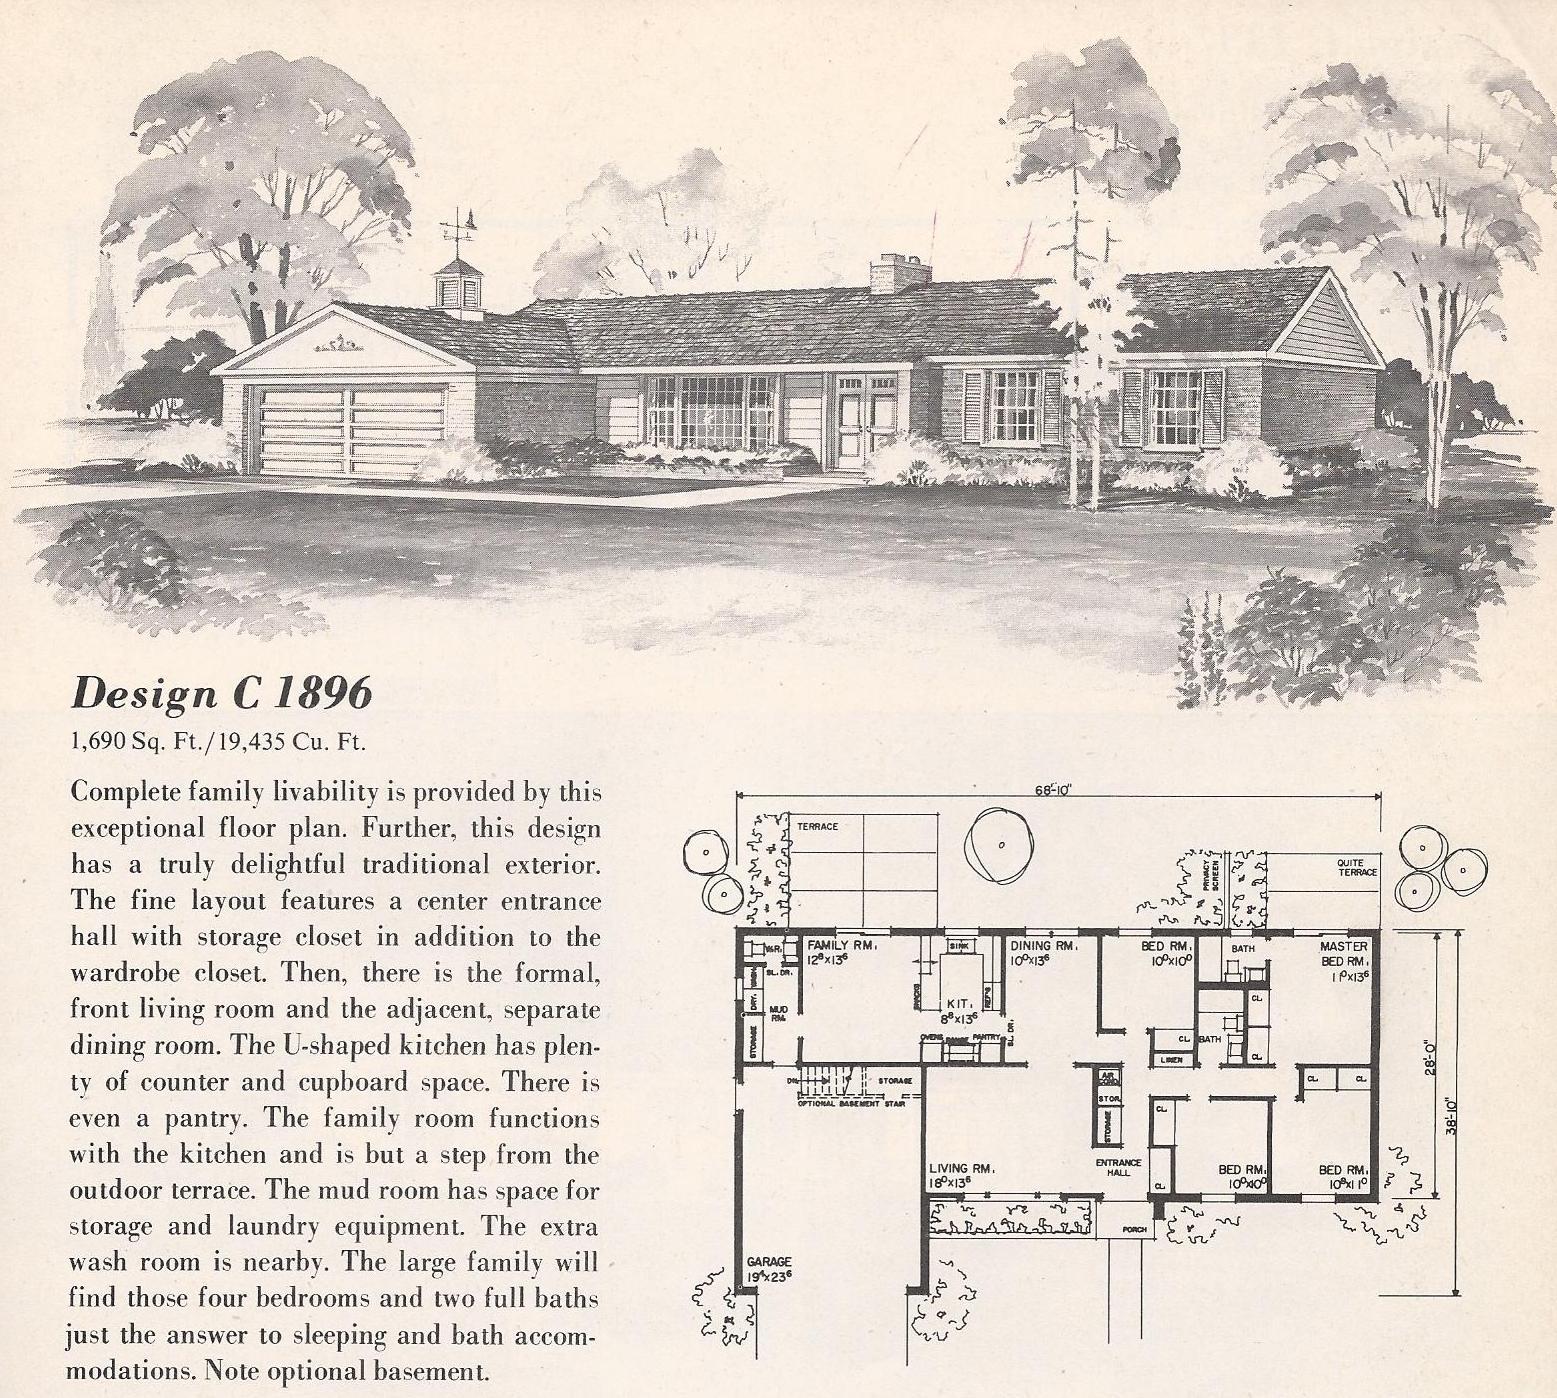 Vintage House Plans C1896 Antique Alter Ego